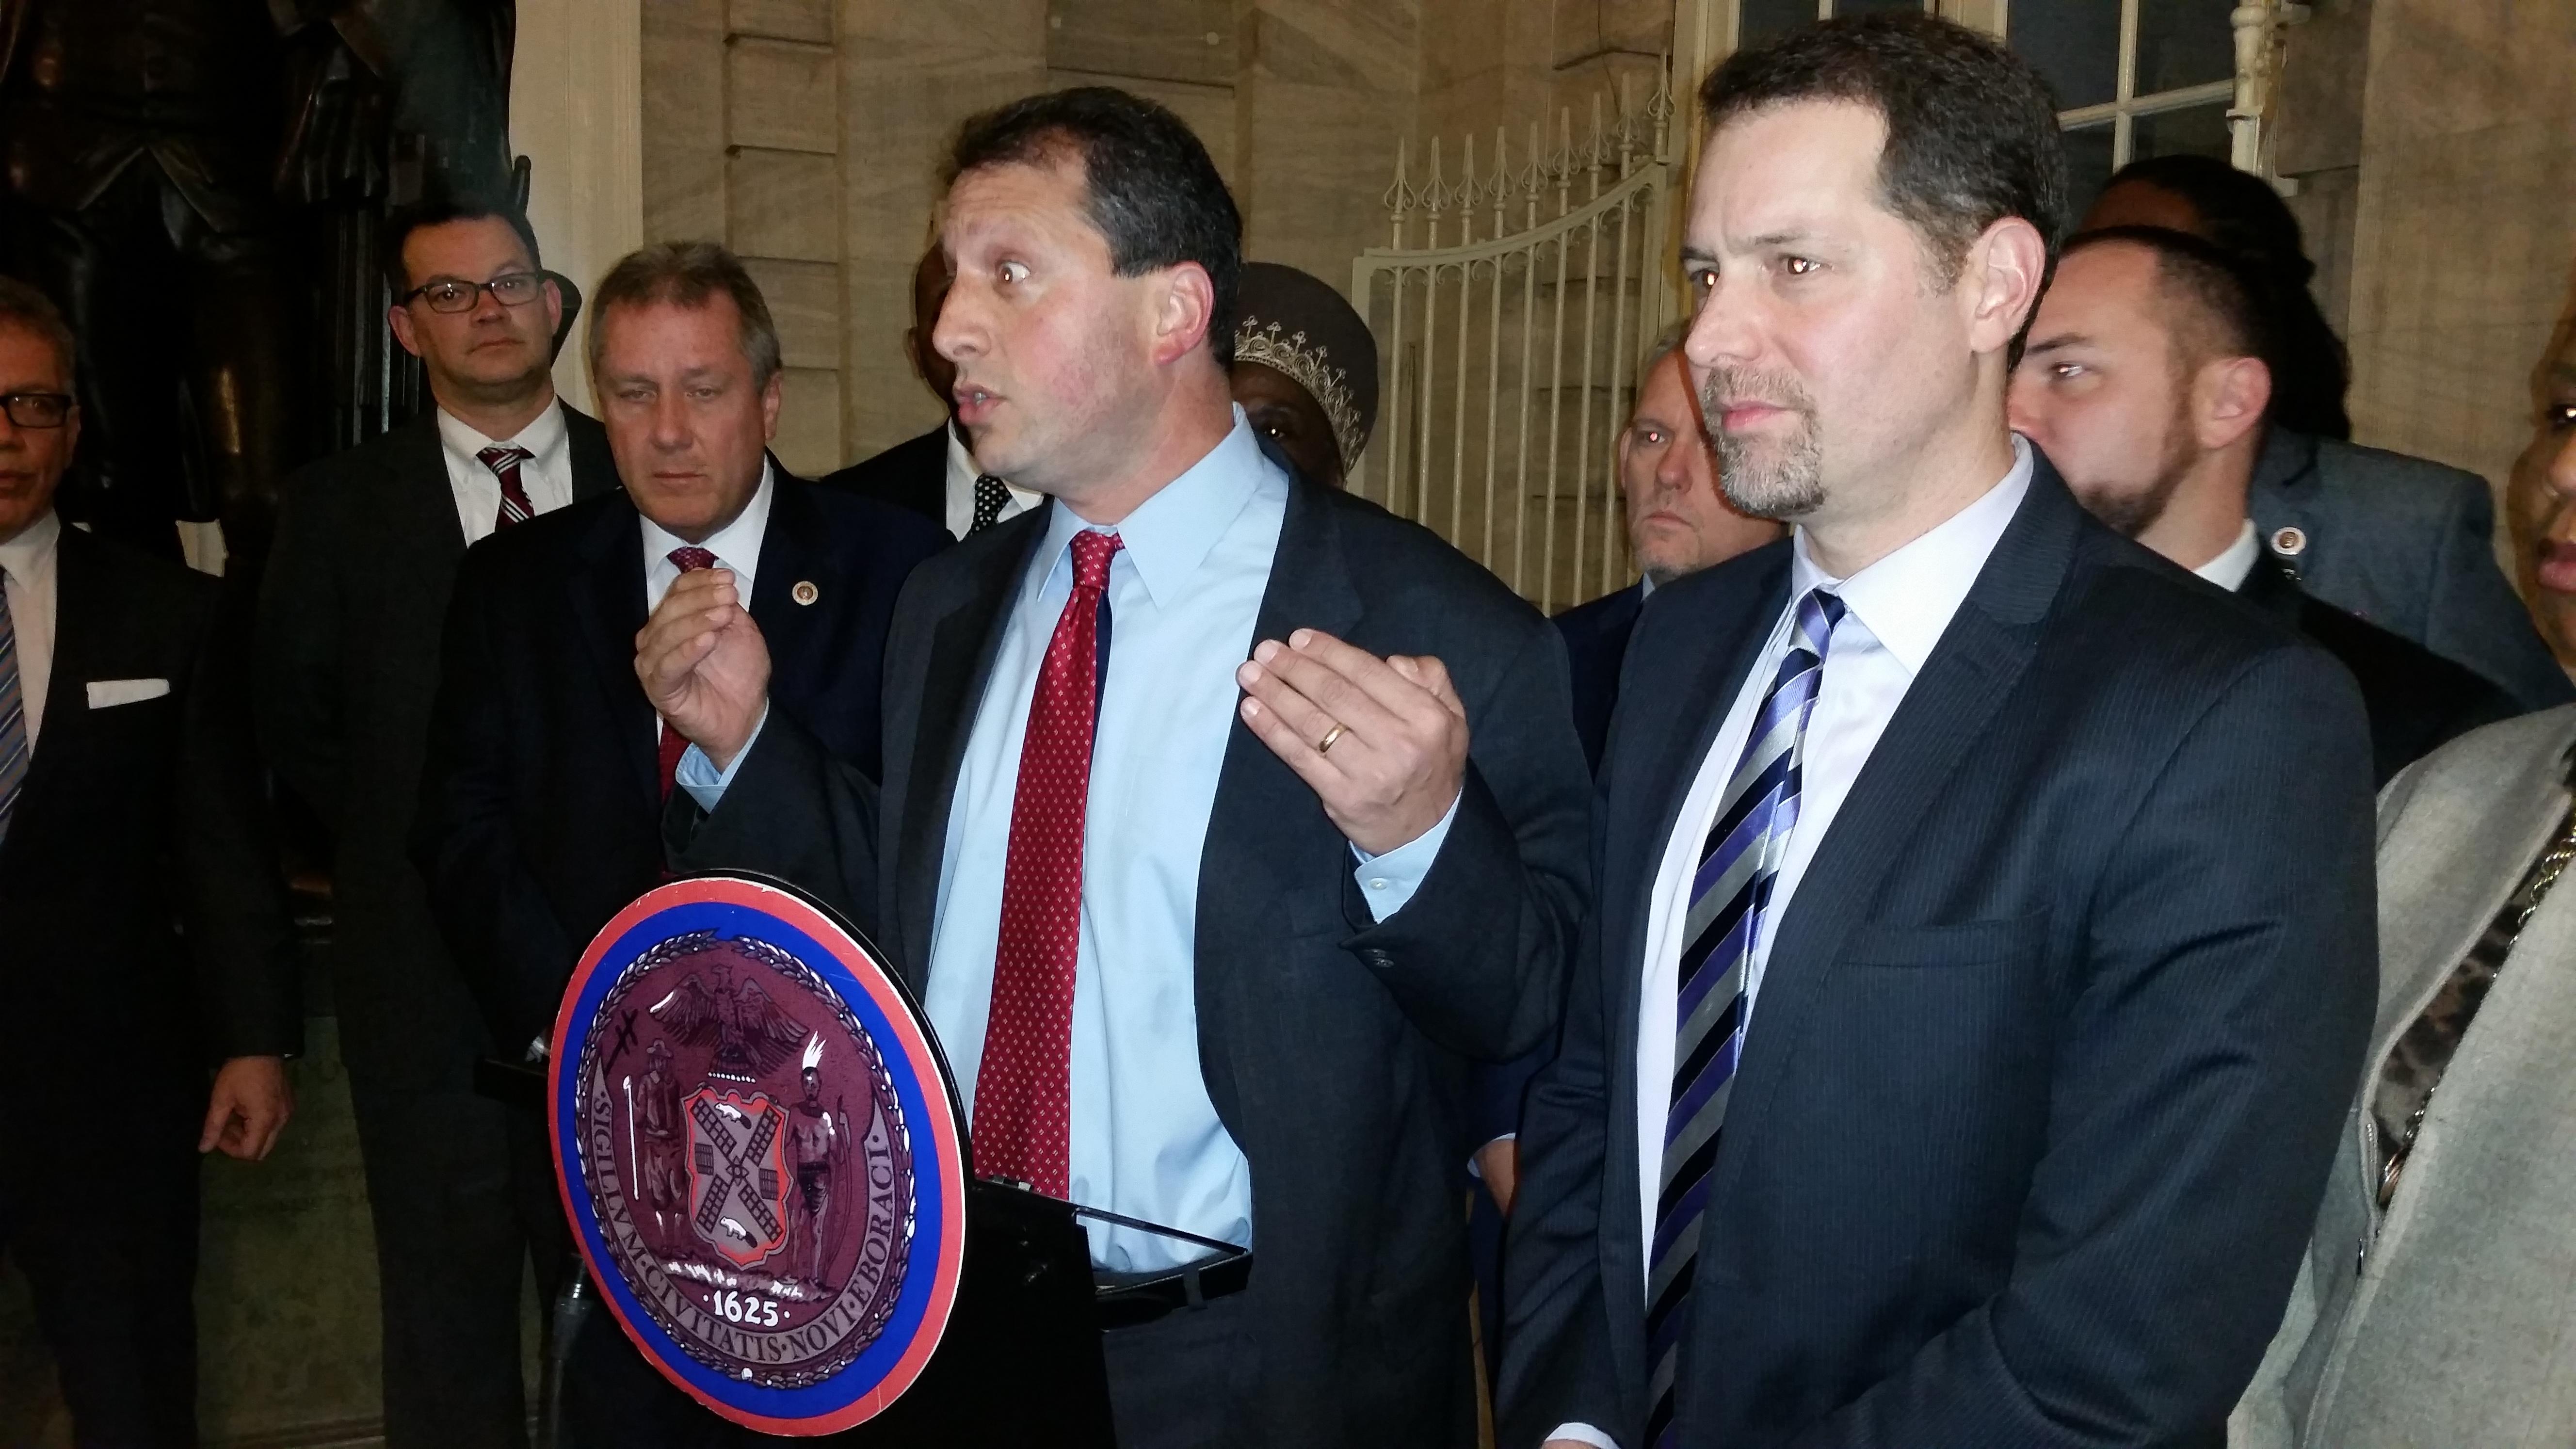 Councilmen Brad Lander and Mark Levine defend Councilwoman Debi Rose. (Photo: Ross Barkan)